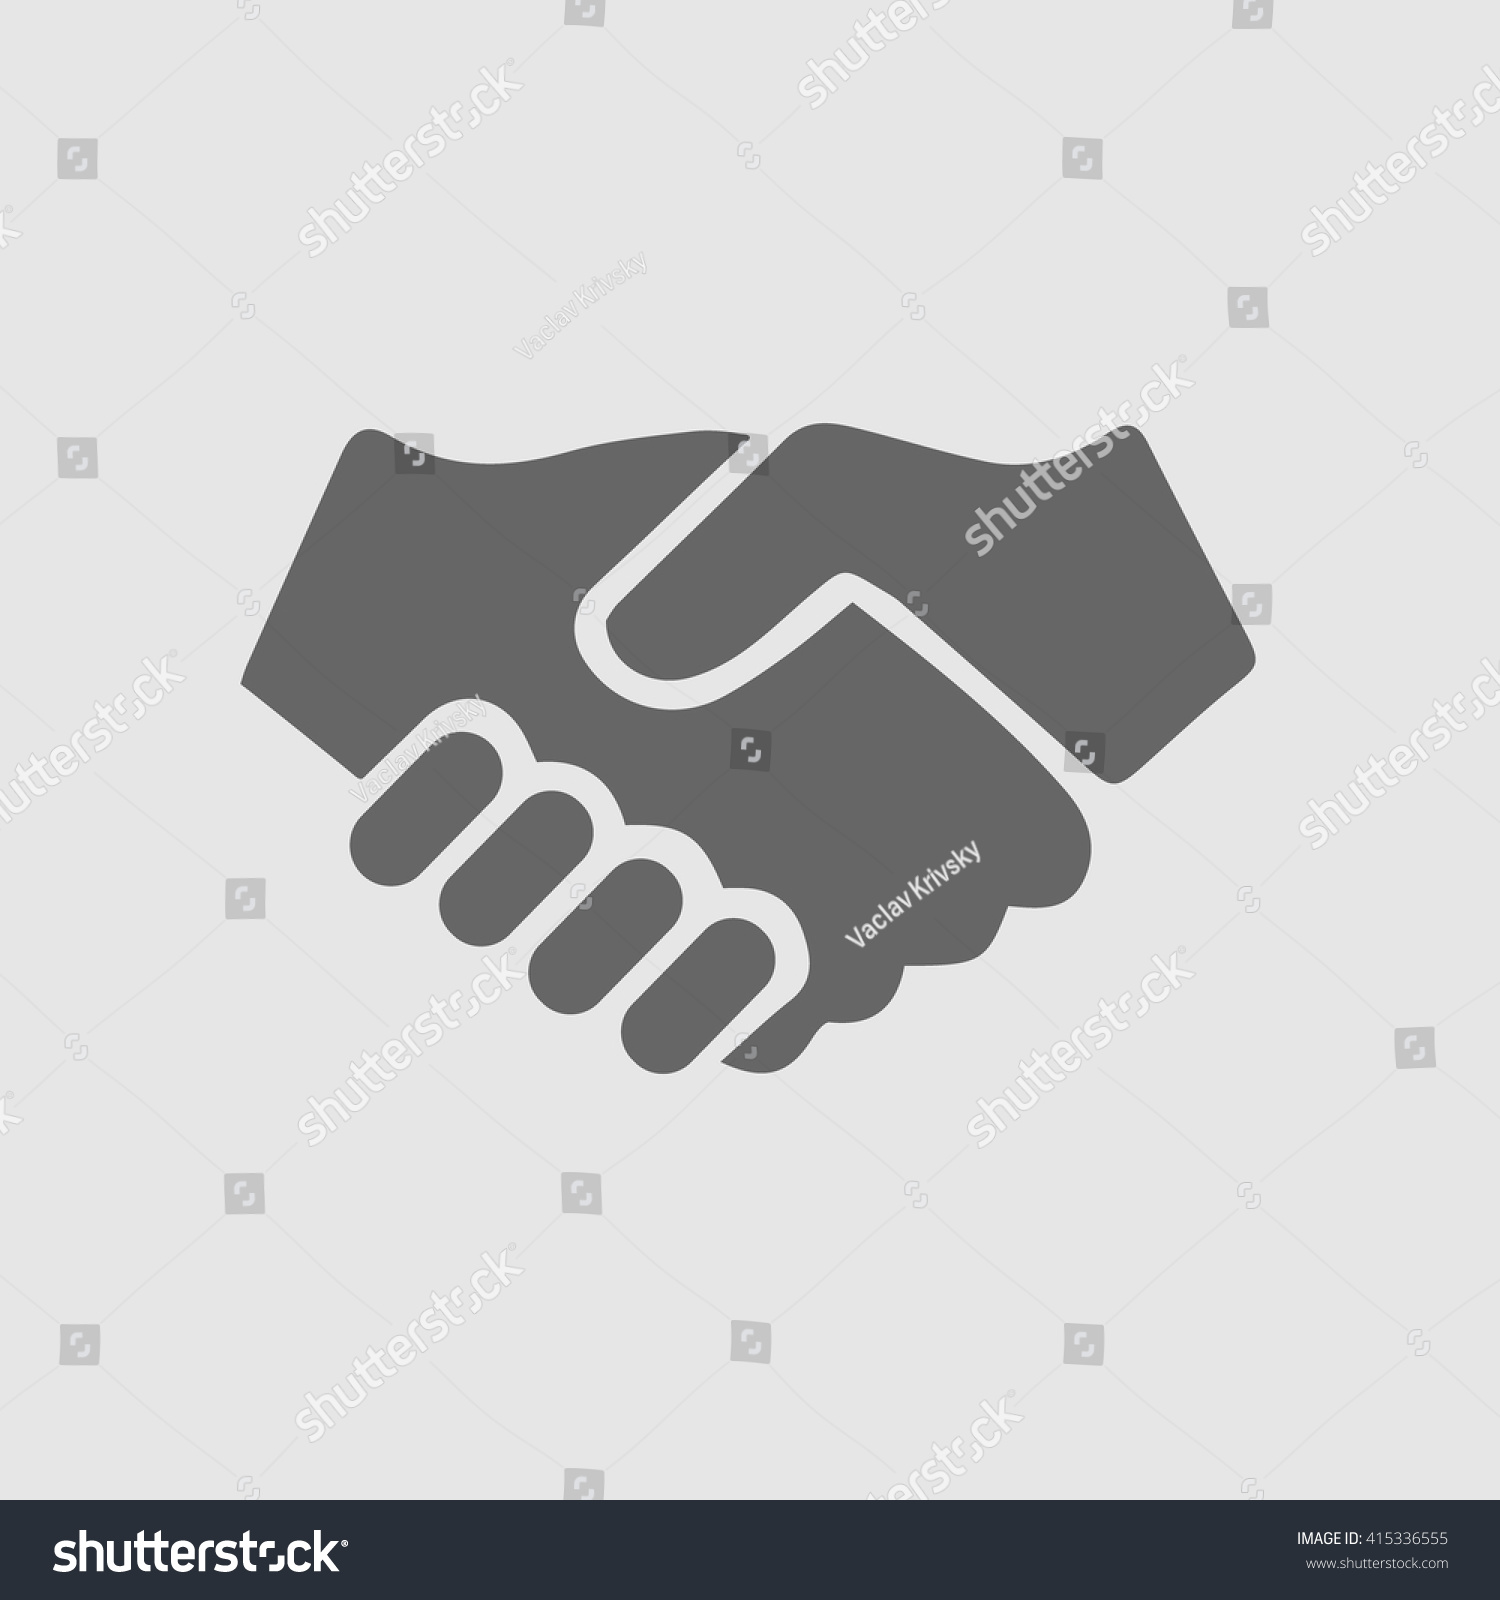 partnership vector handshake icon hand shaking のベクター画像素材